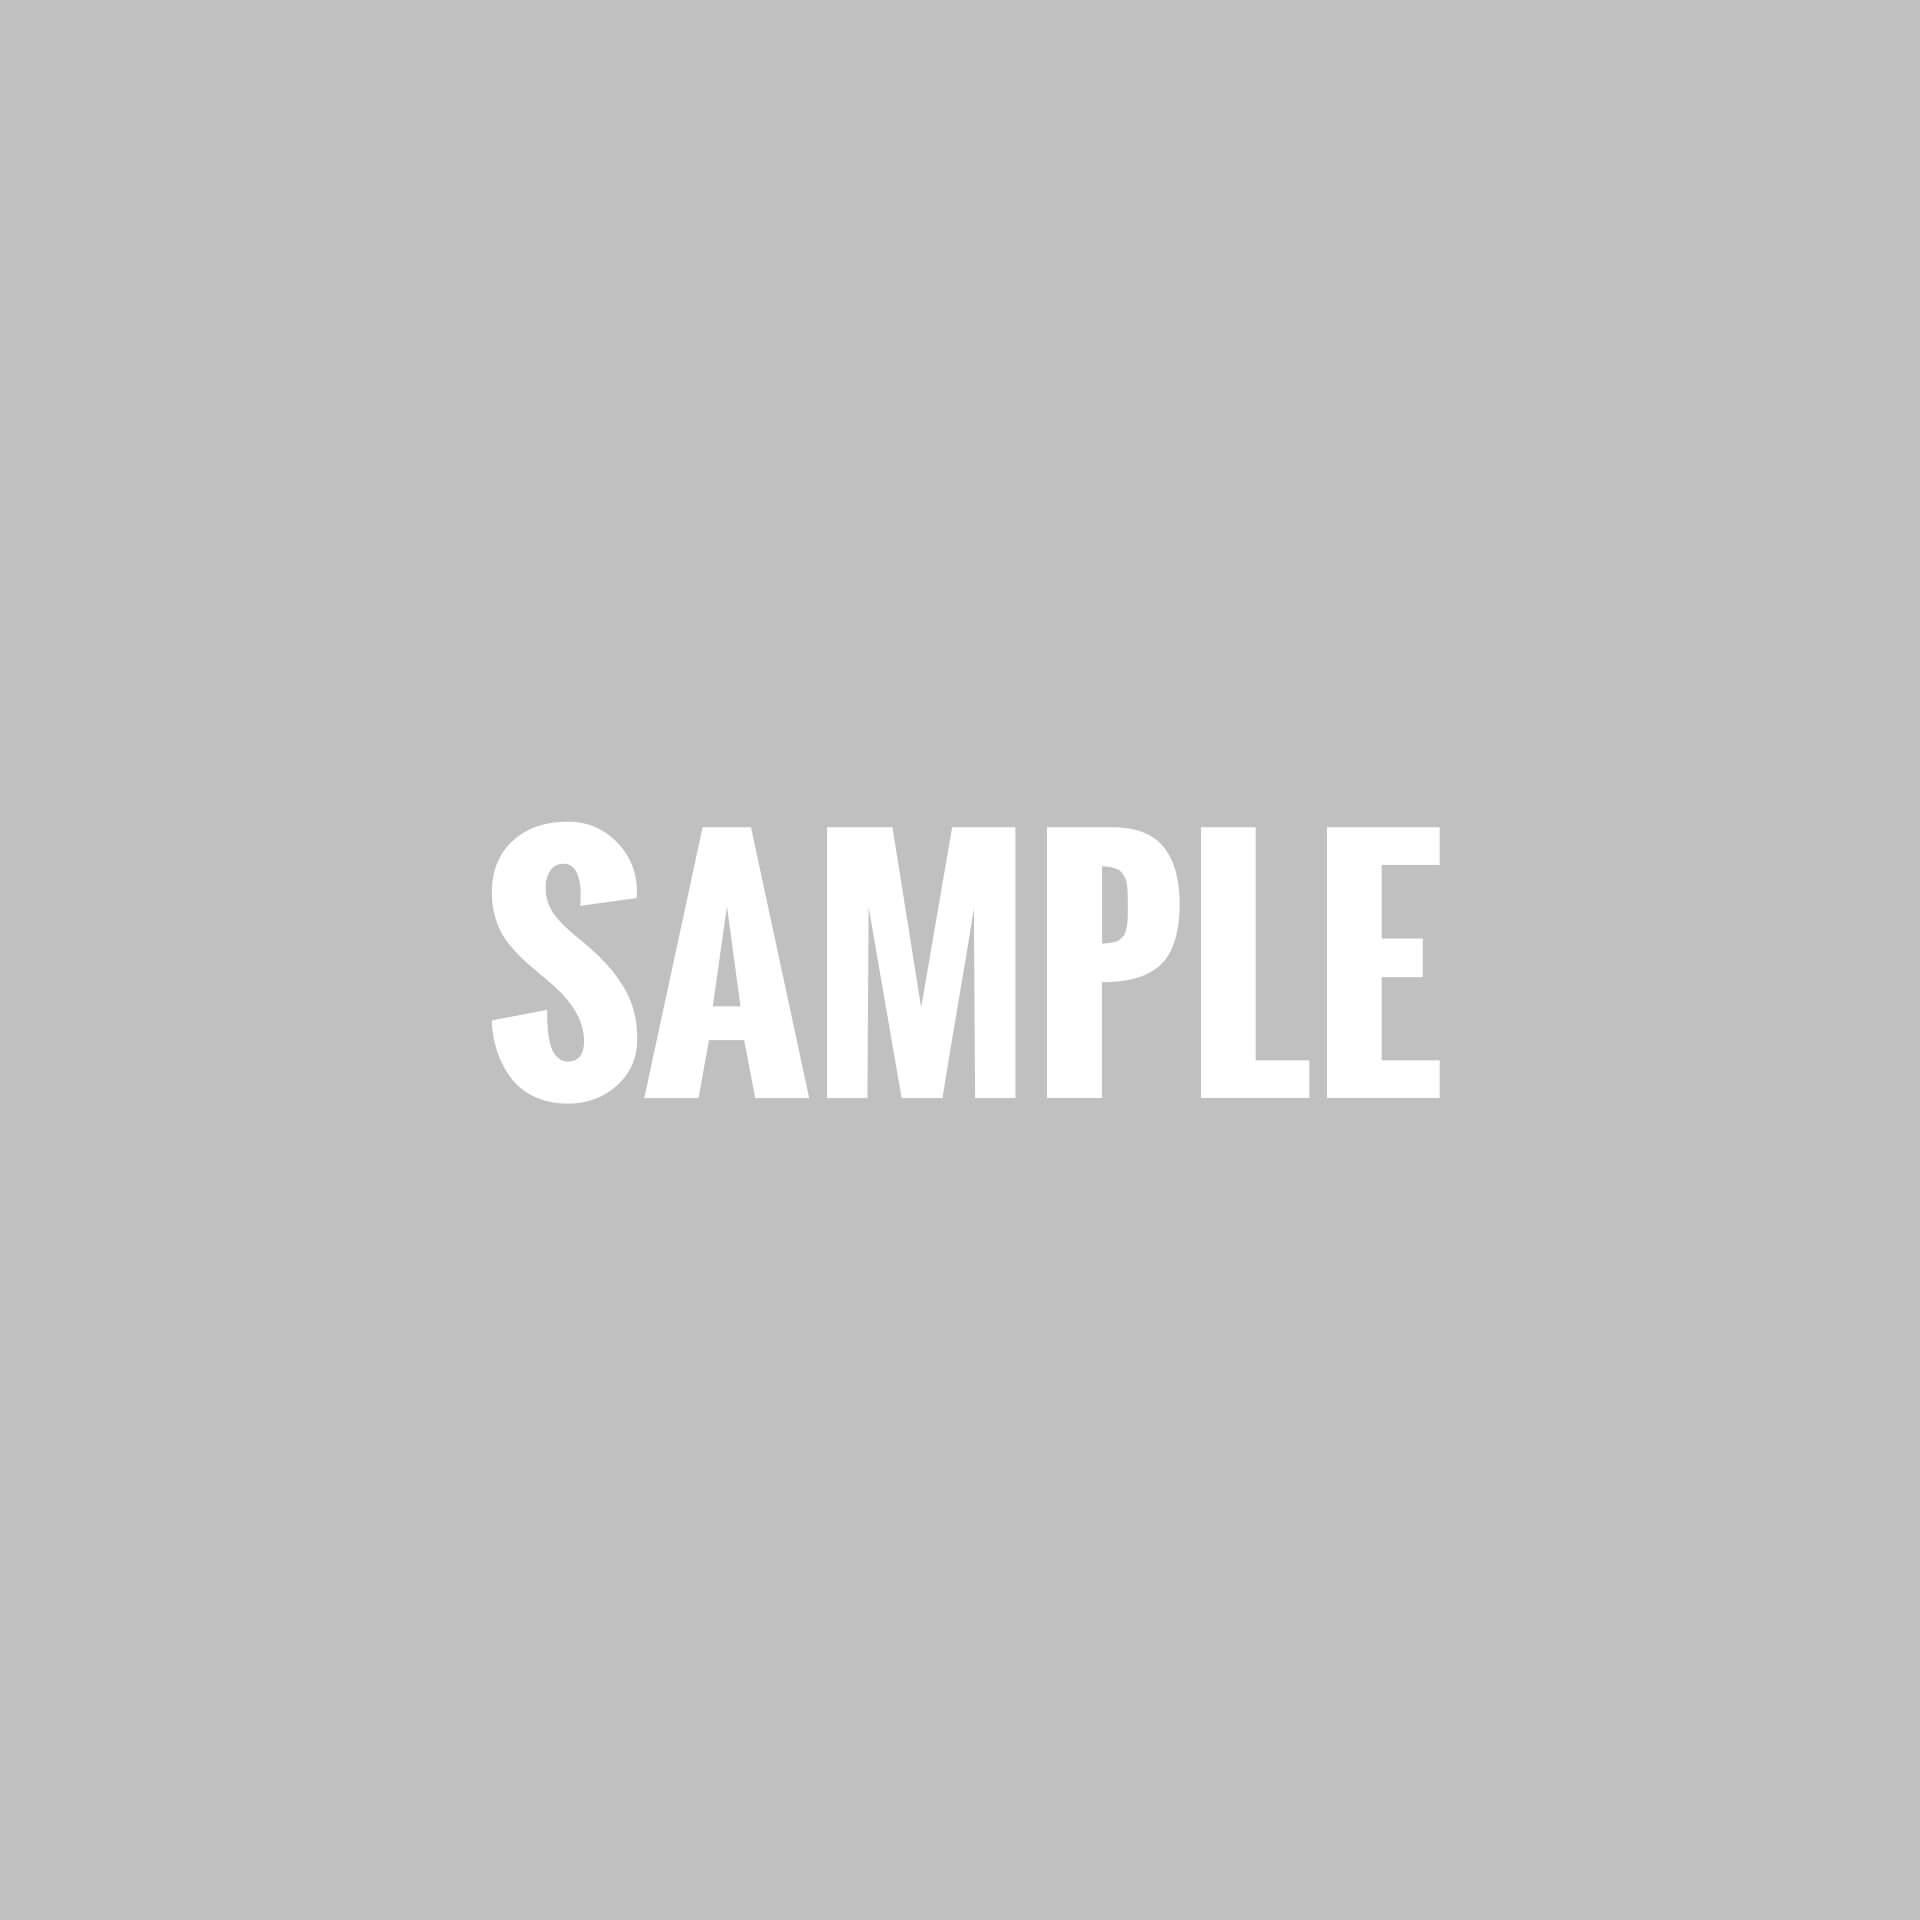 sample_3-1920x1920